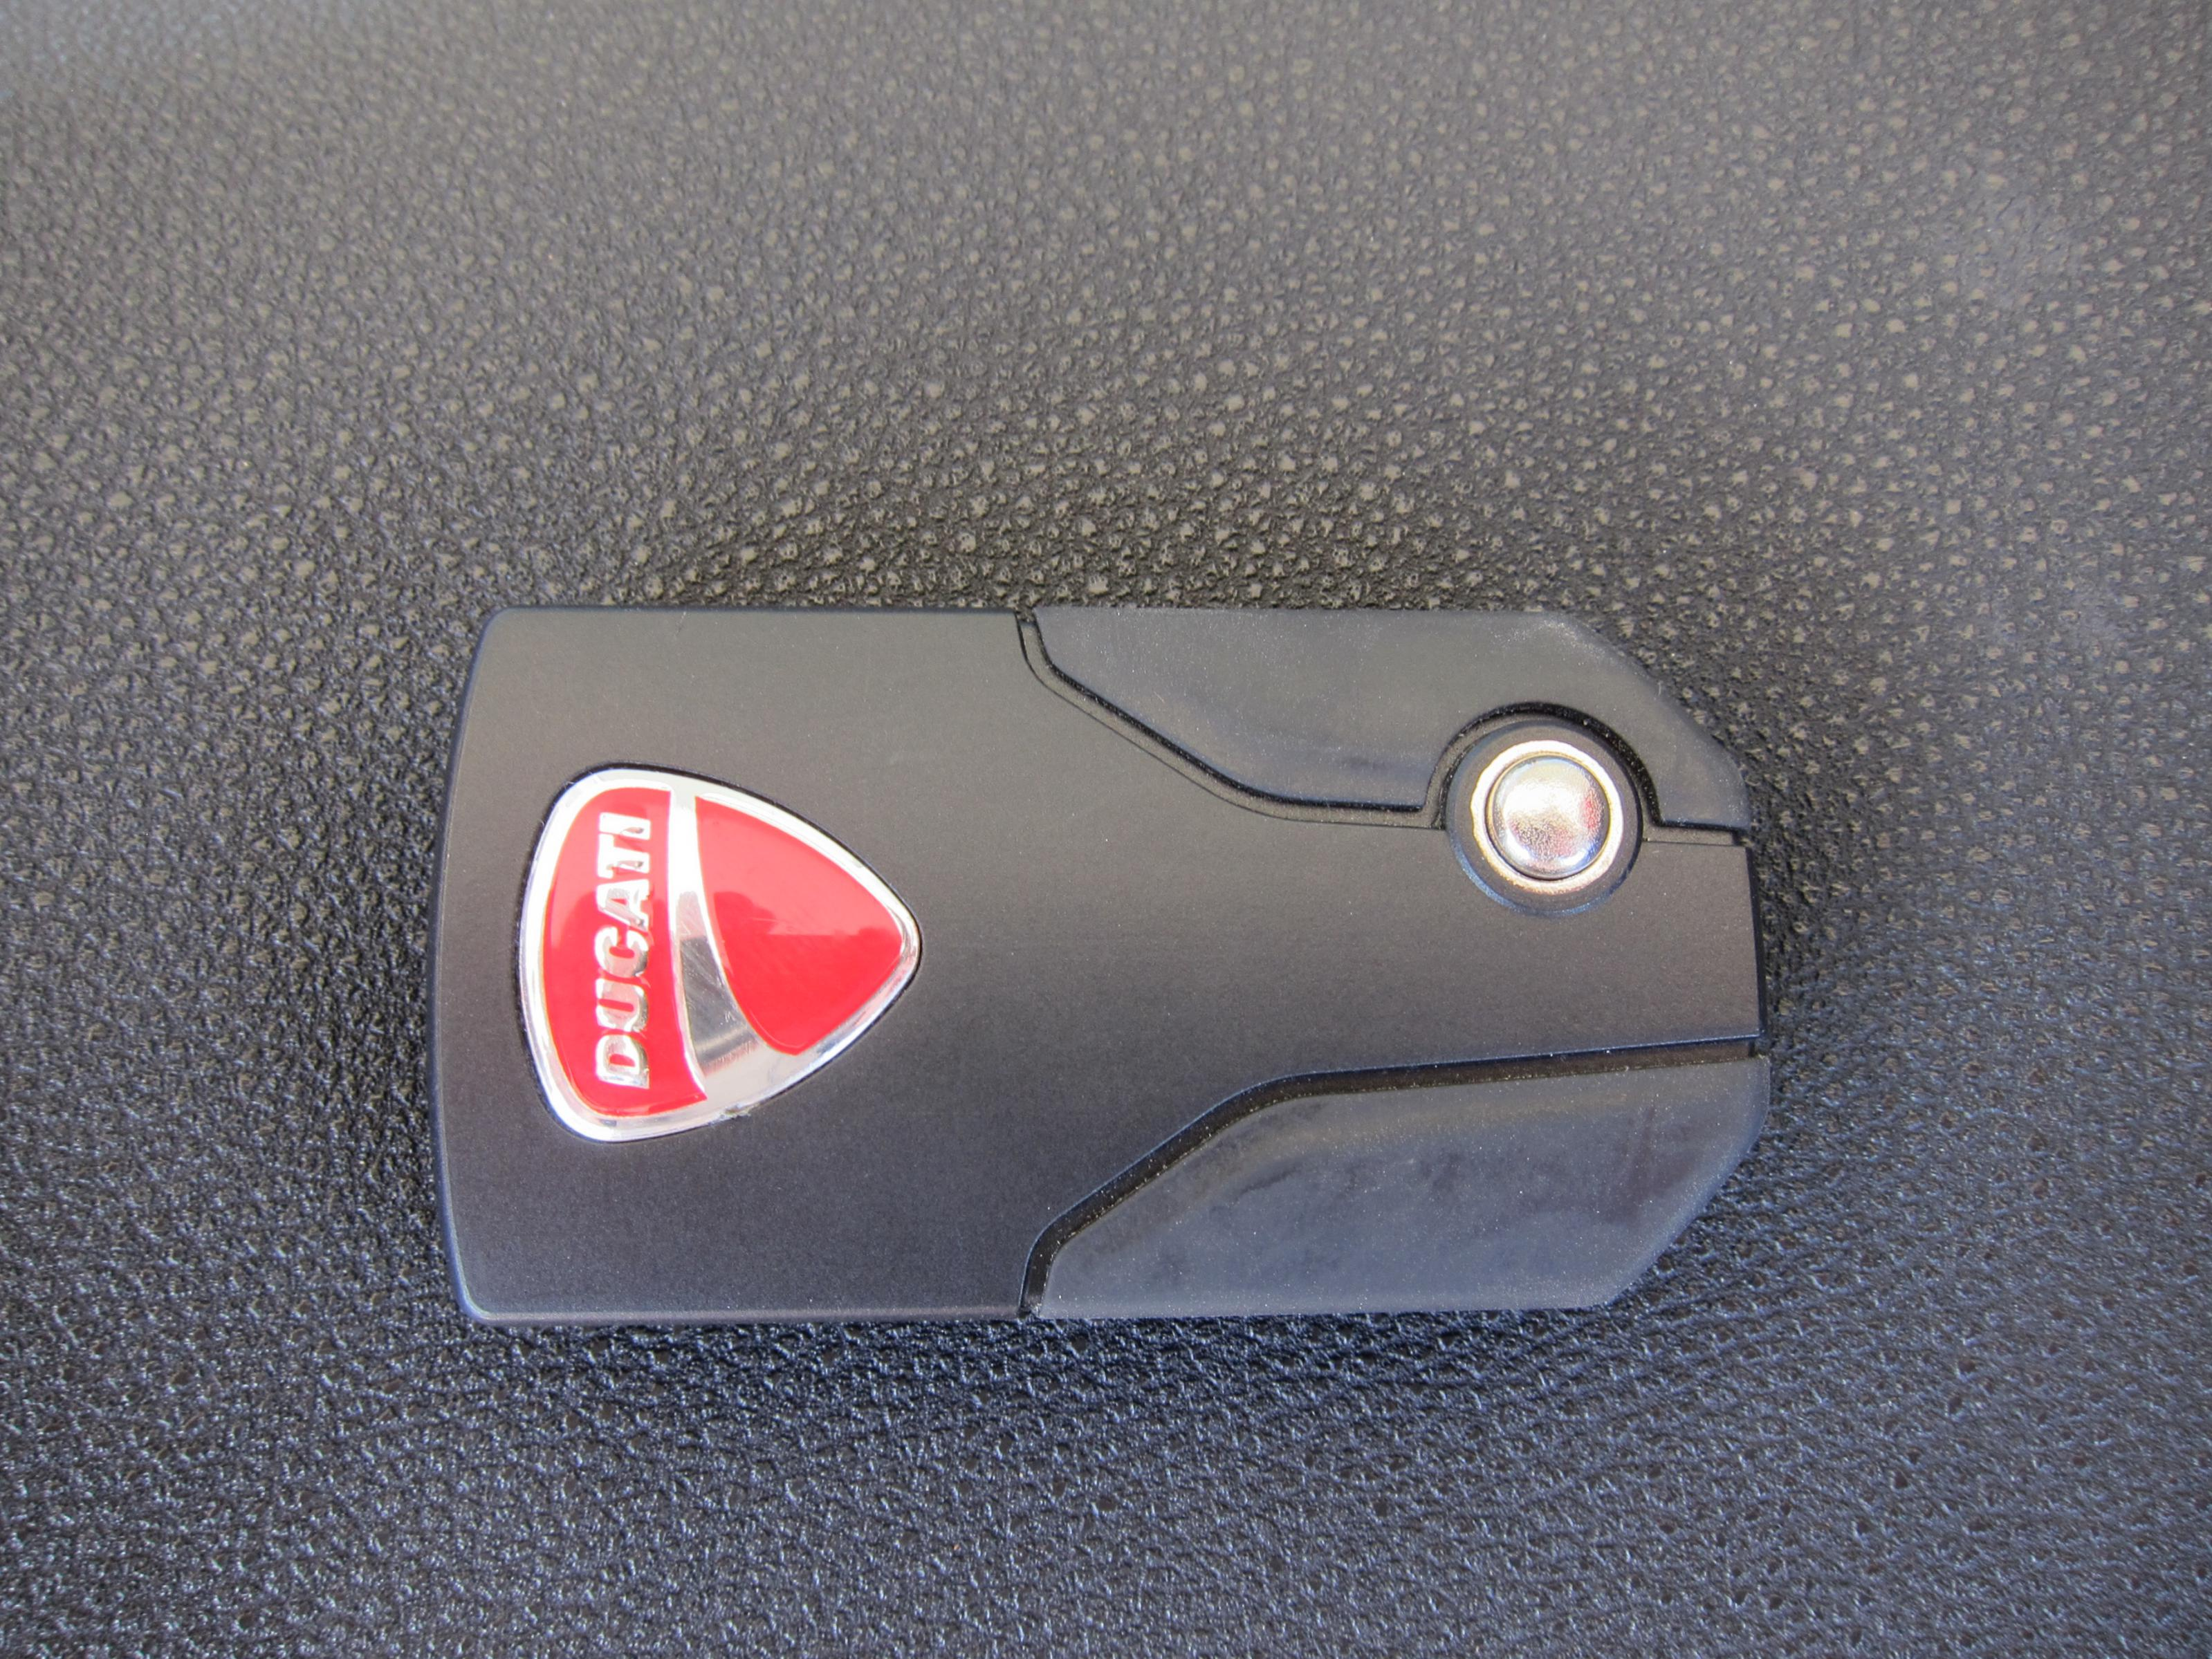 2010 multistrada - red key? - Ducati ms - The Ultimate Ducati Forum